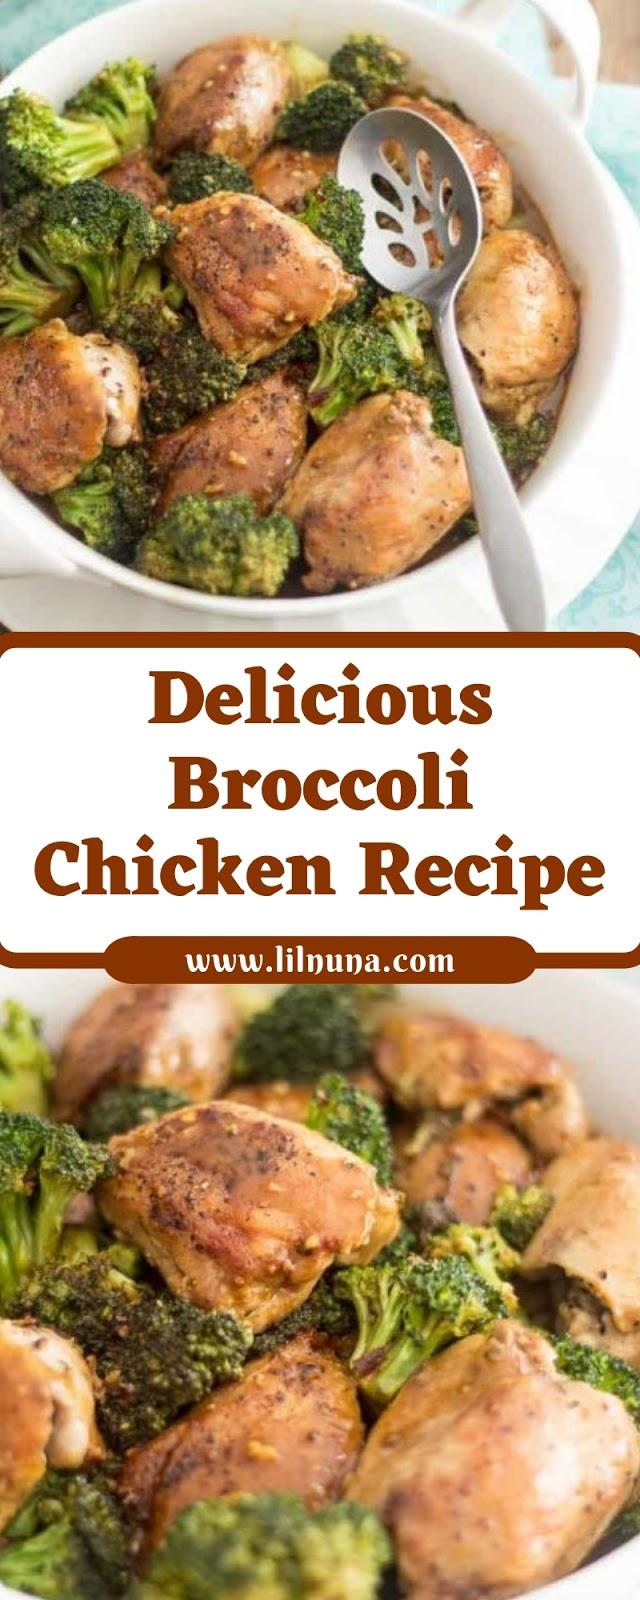 Delicious Broccoli Chicken Recipe